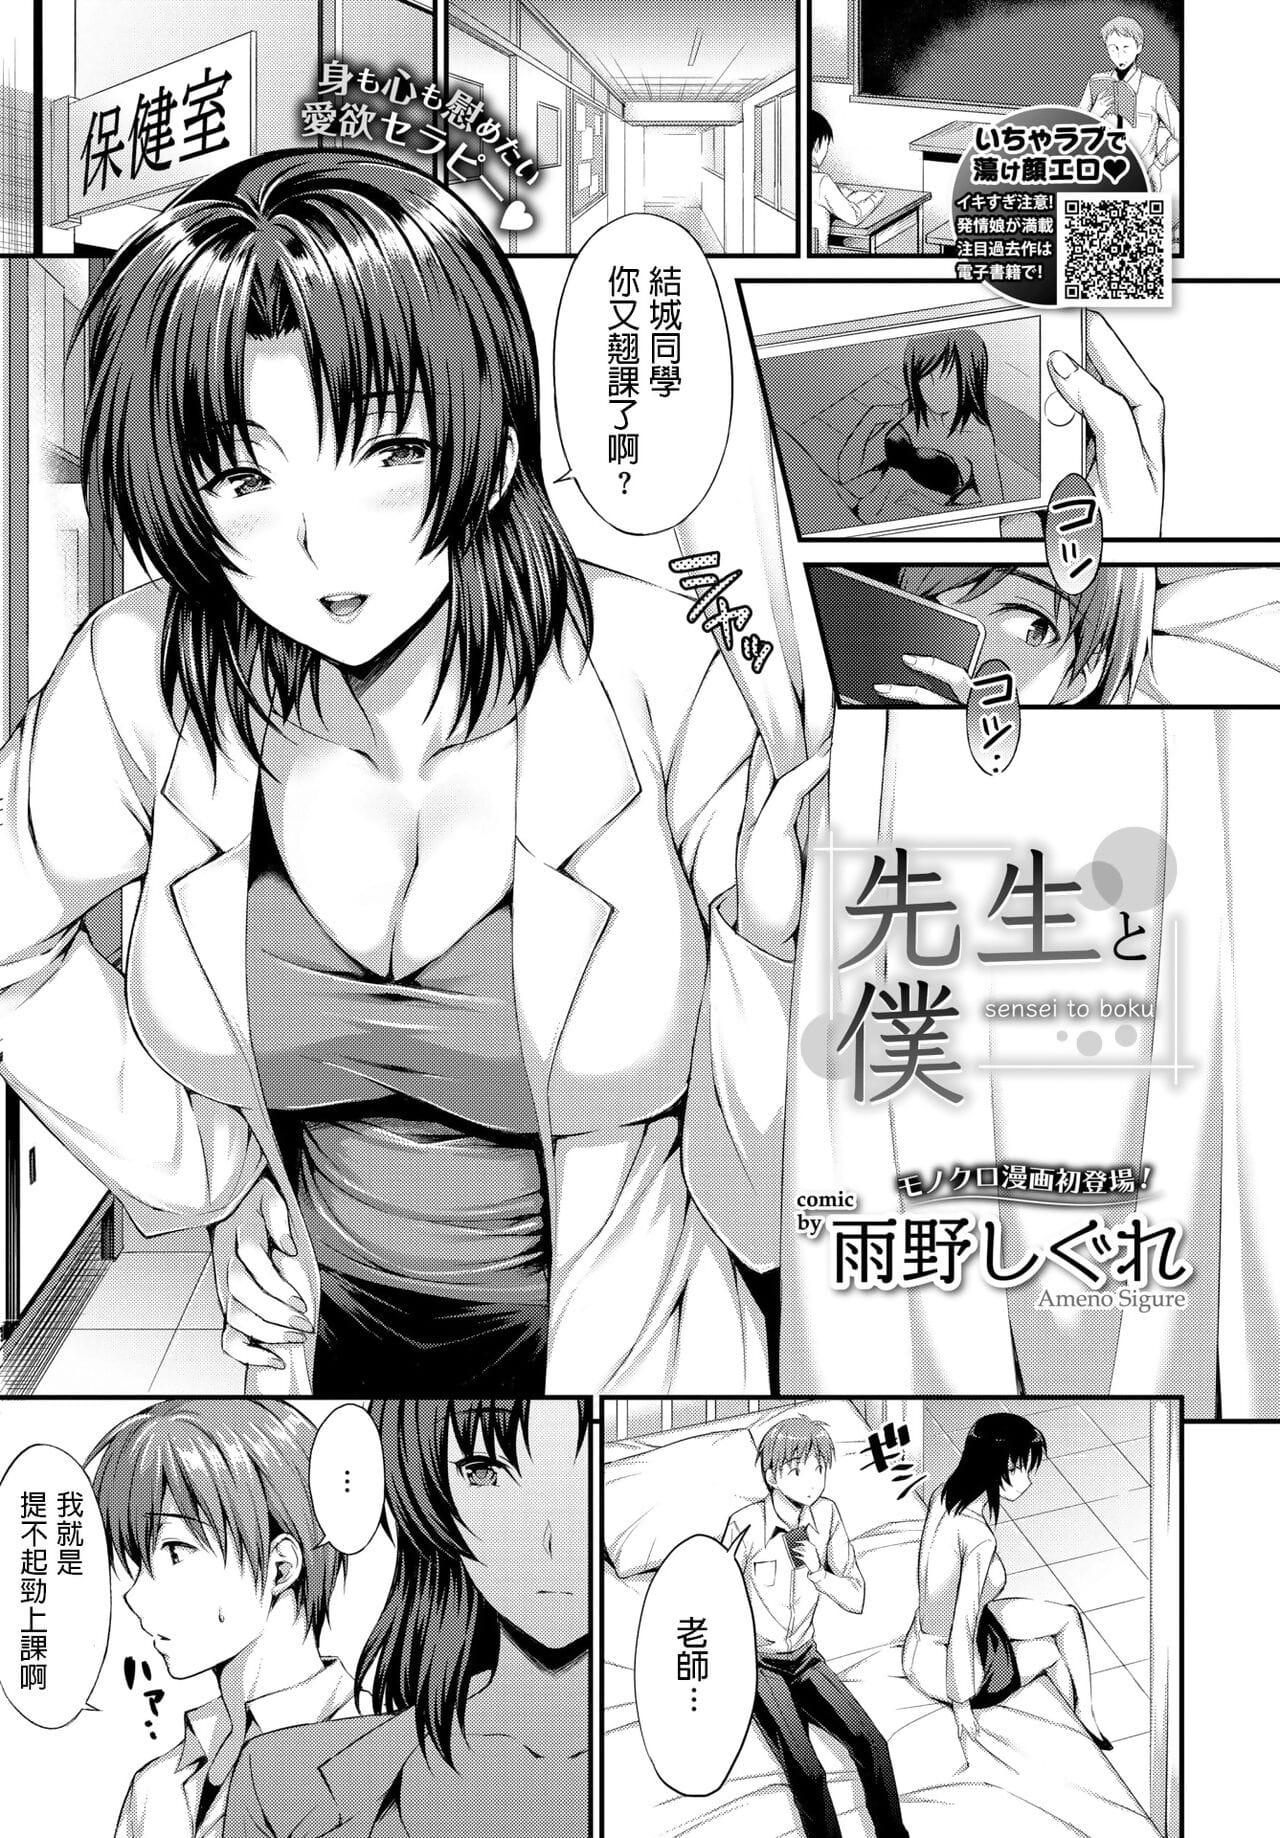 sensei with respect to boku